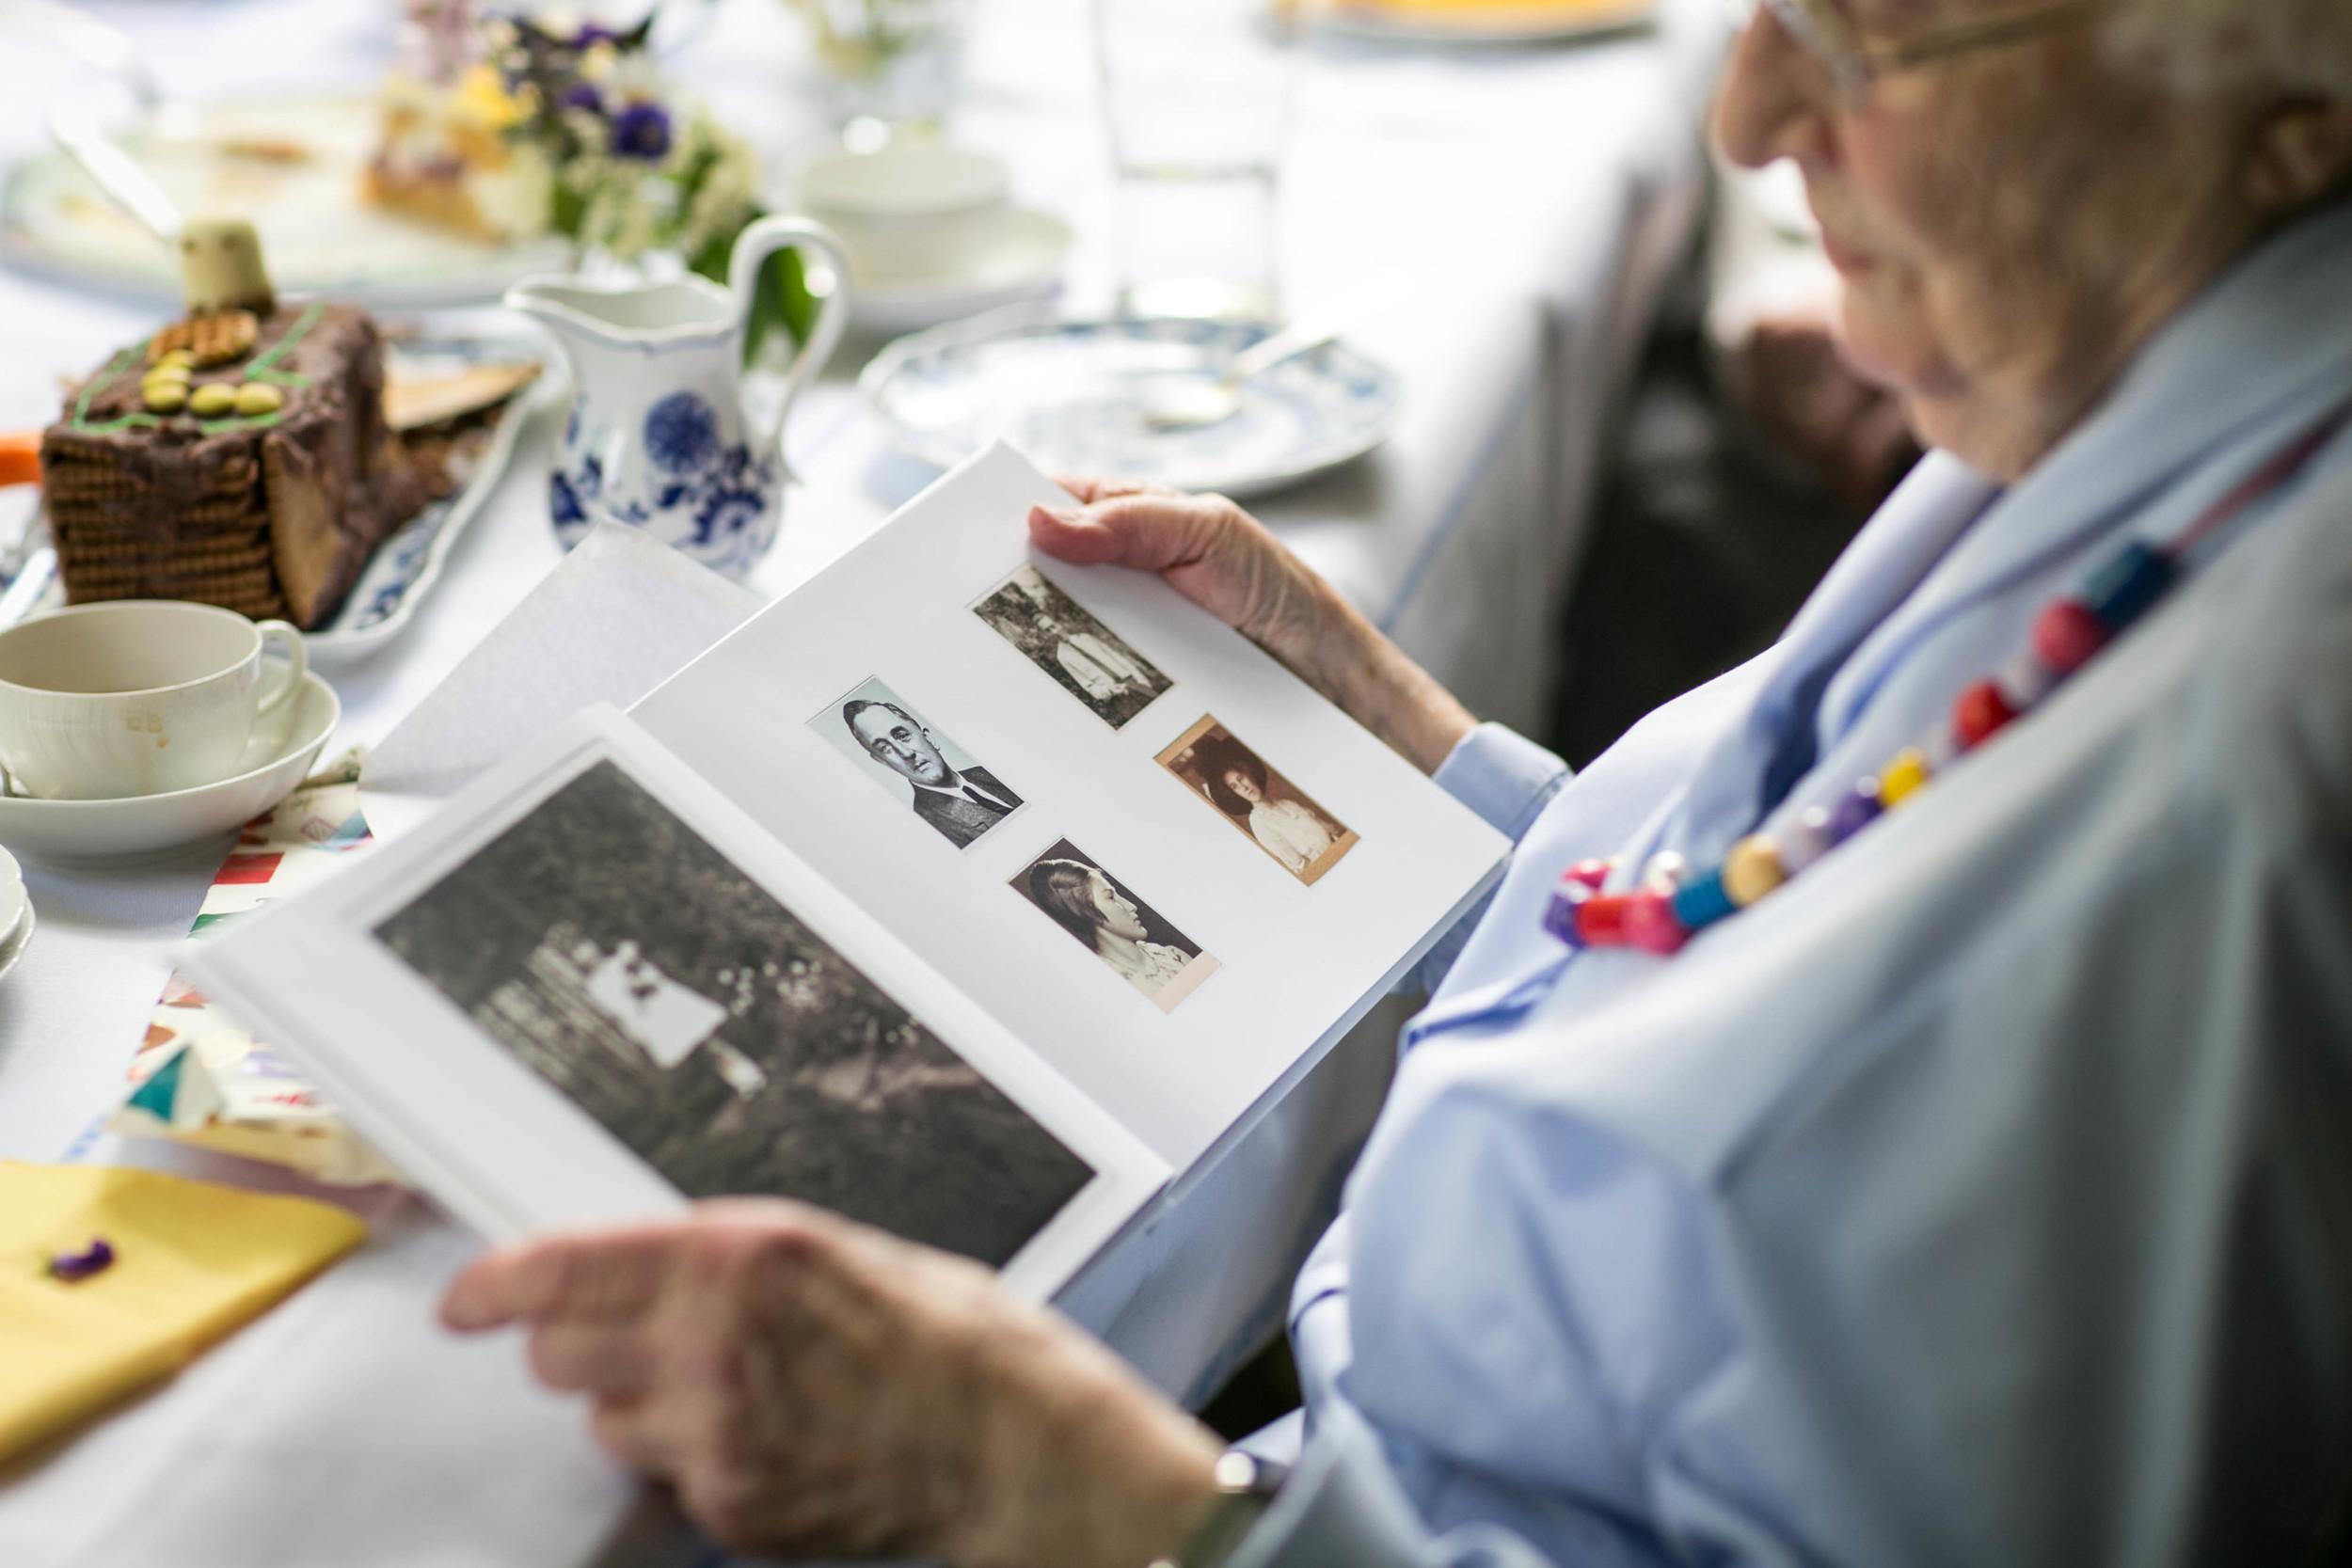 Fran Burrows Hochzeitsfotografie Berlin-35.jpg